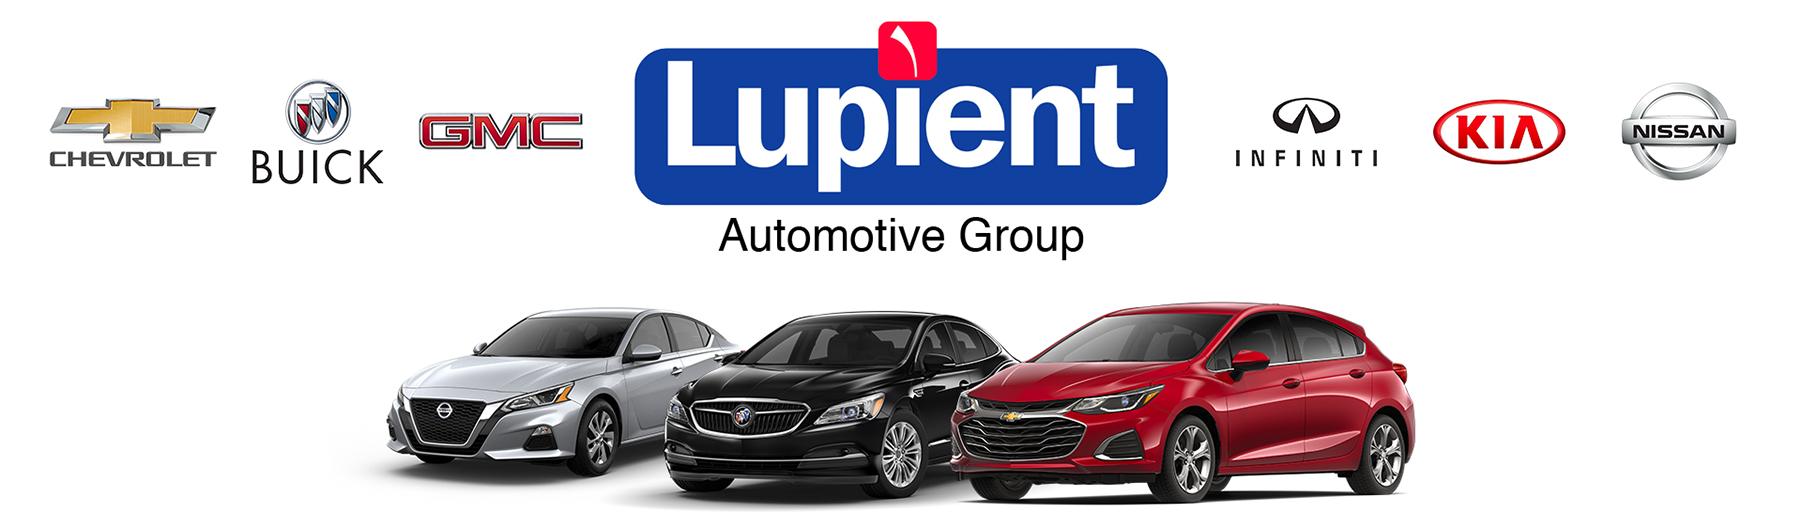 Used Cars Minneapolis >> Used Carsused Cars In Minneapolis Milwaukee Lupient Automotive Group